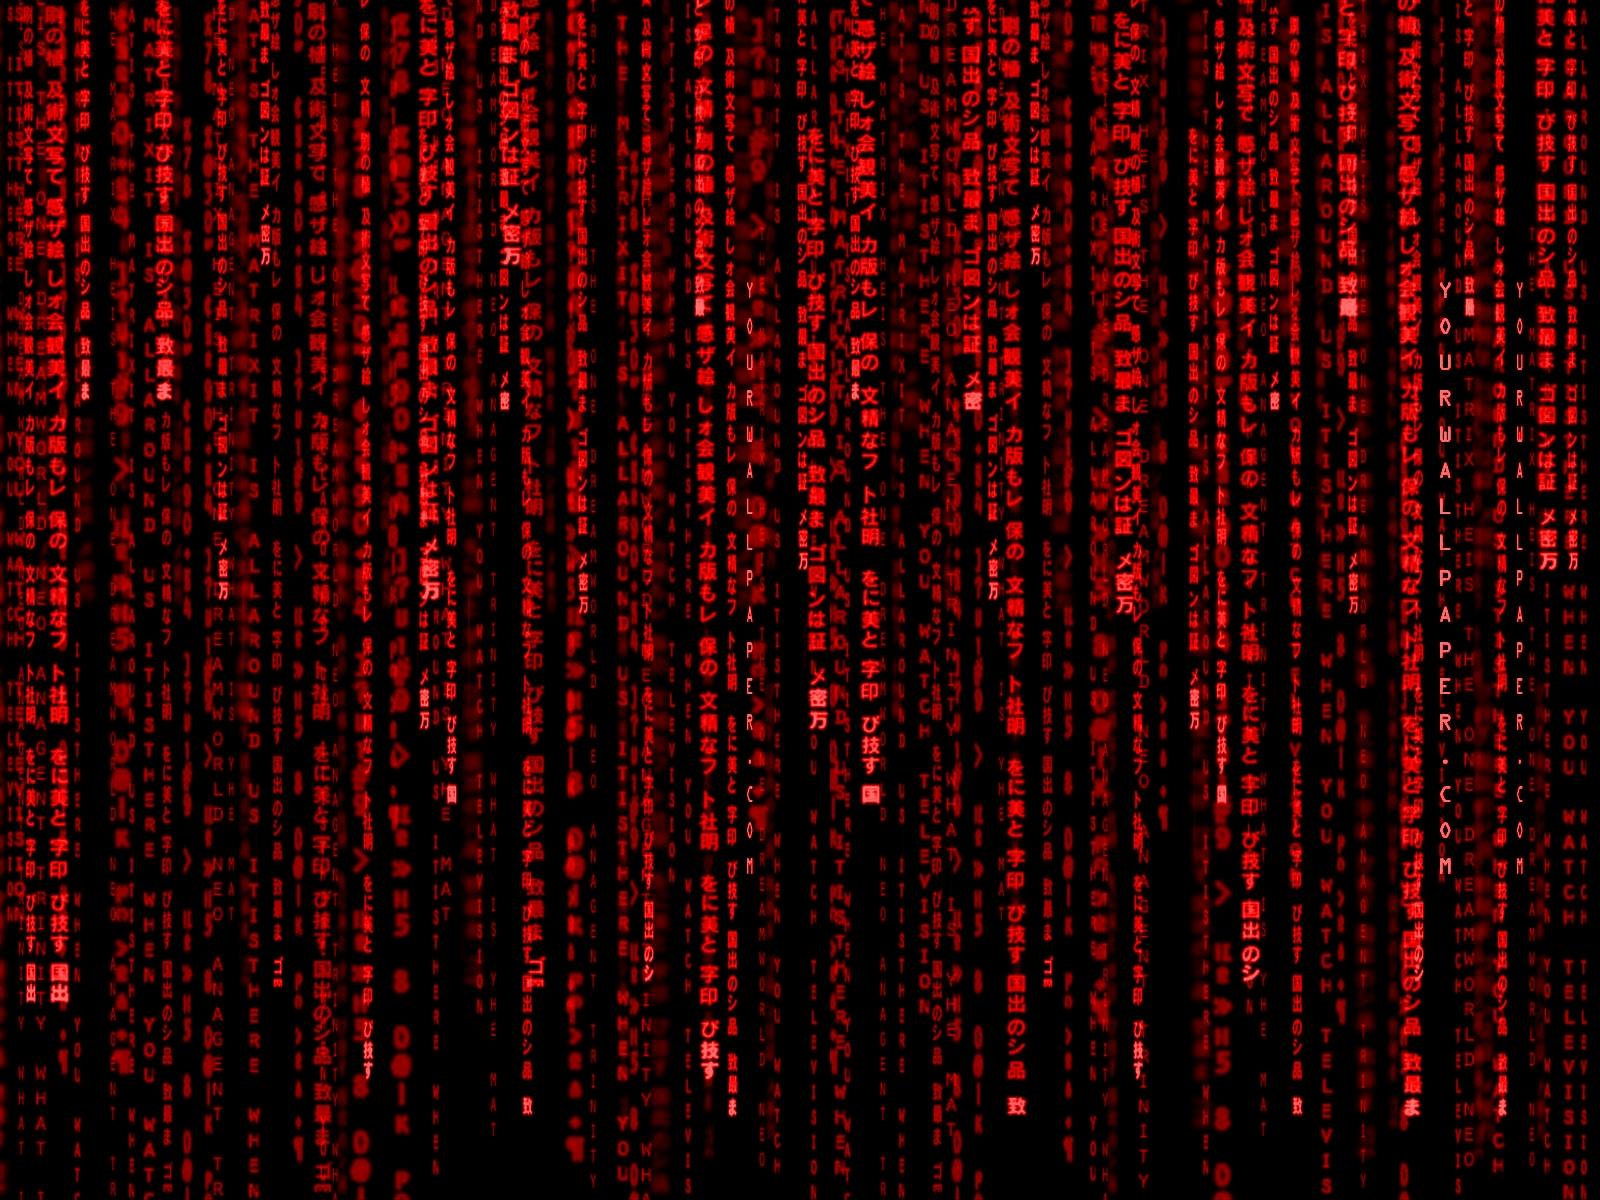 Red Matrix Wallpaper 1600x1200 Red Matrix Code 1600x1200